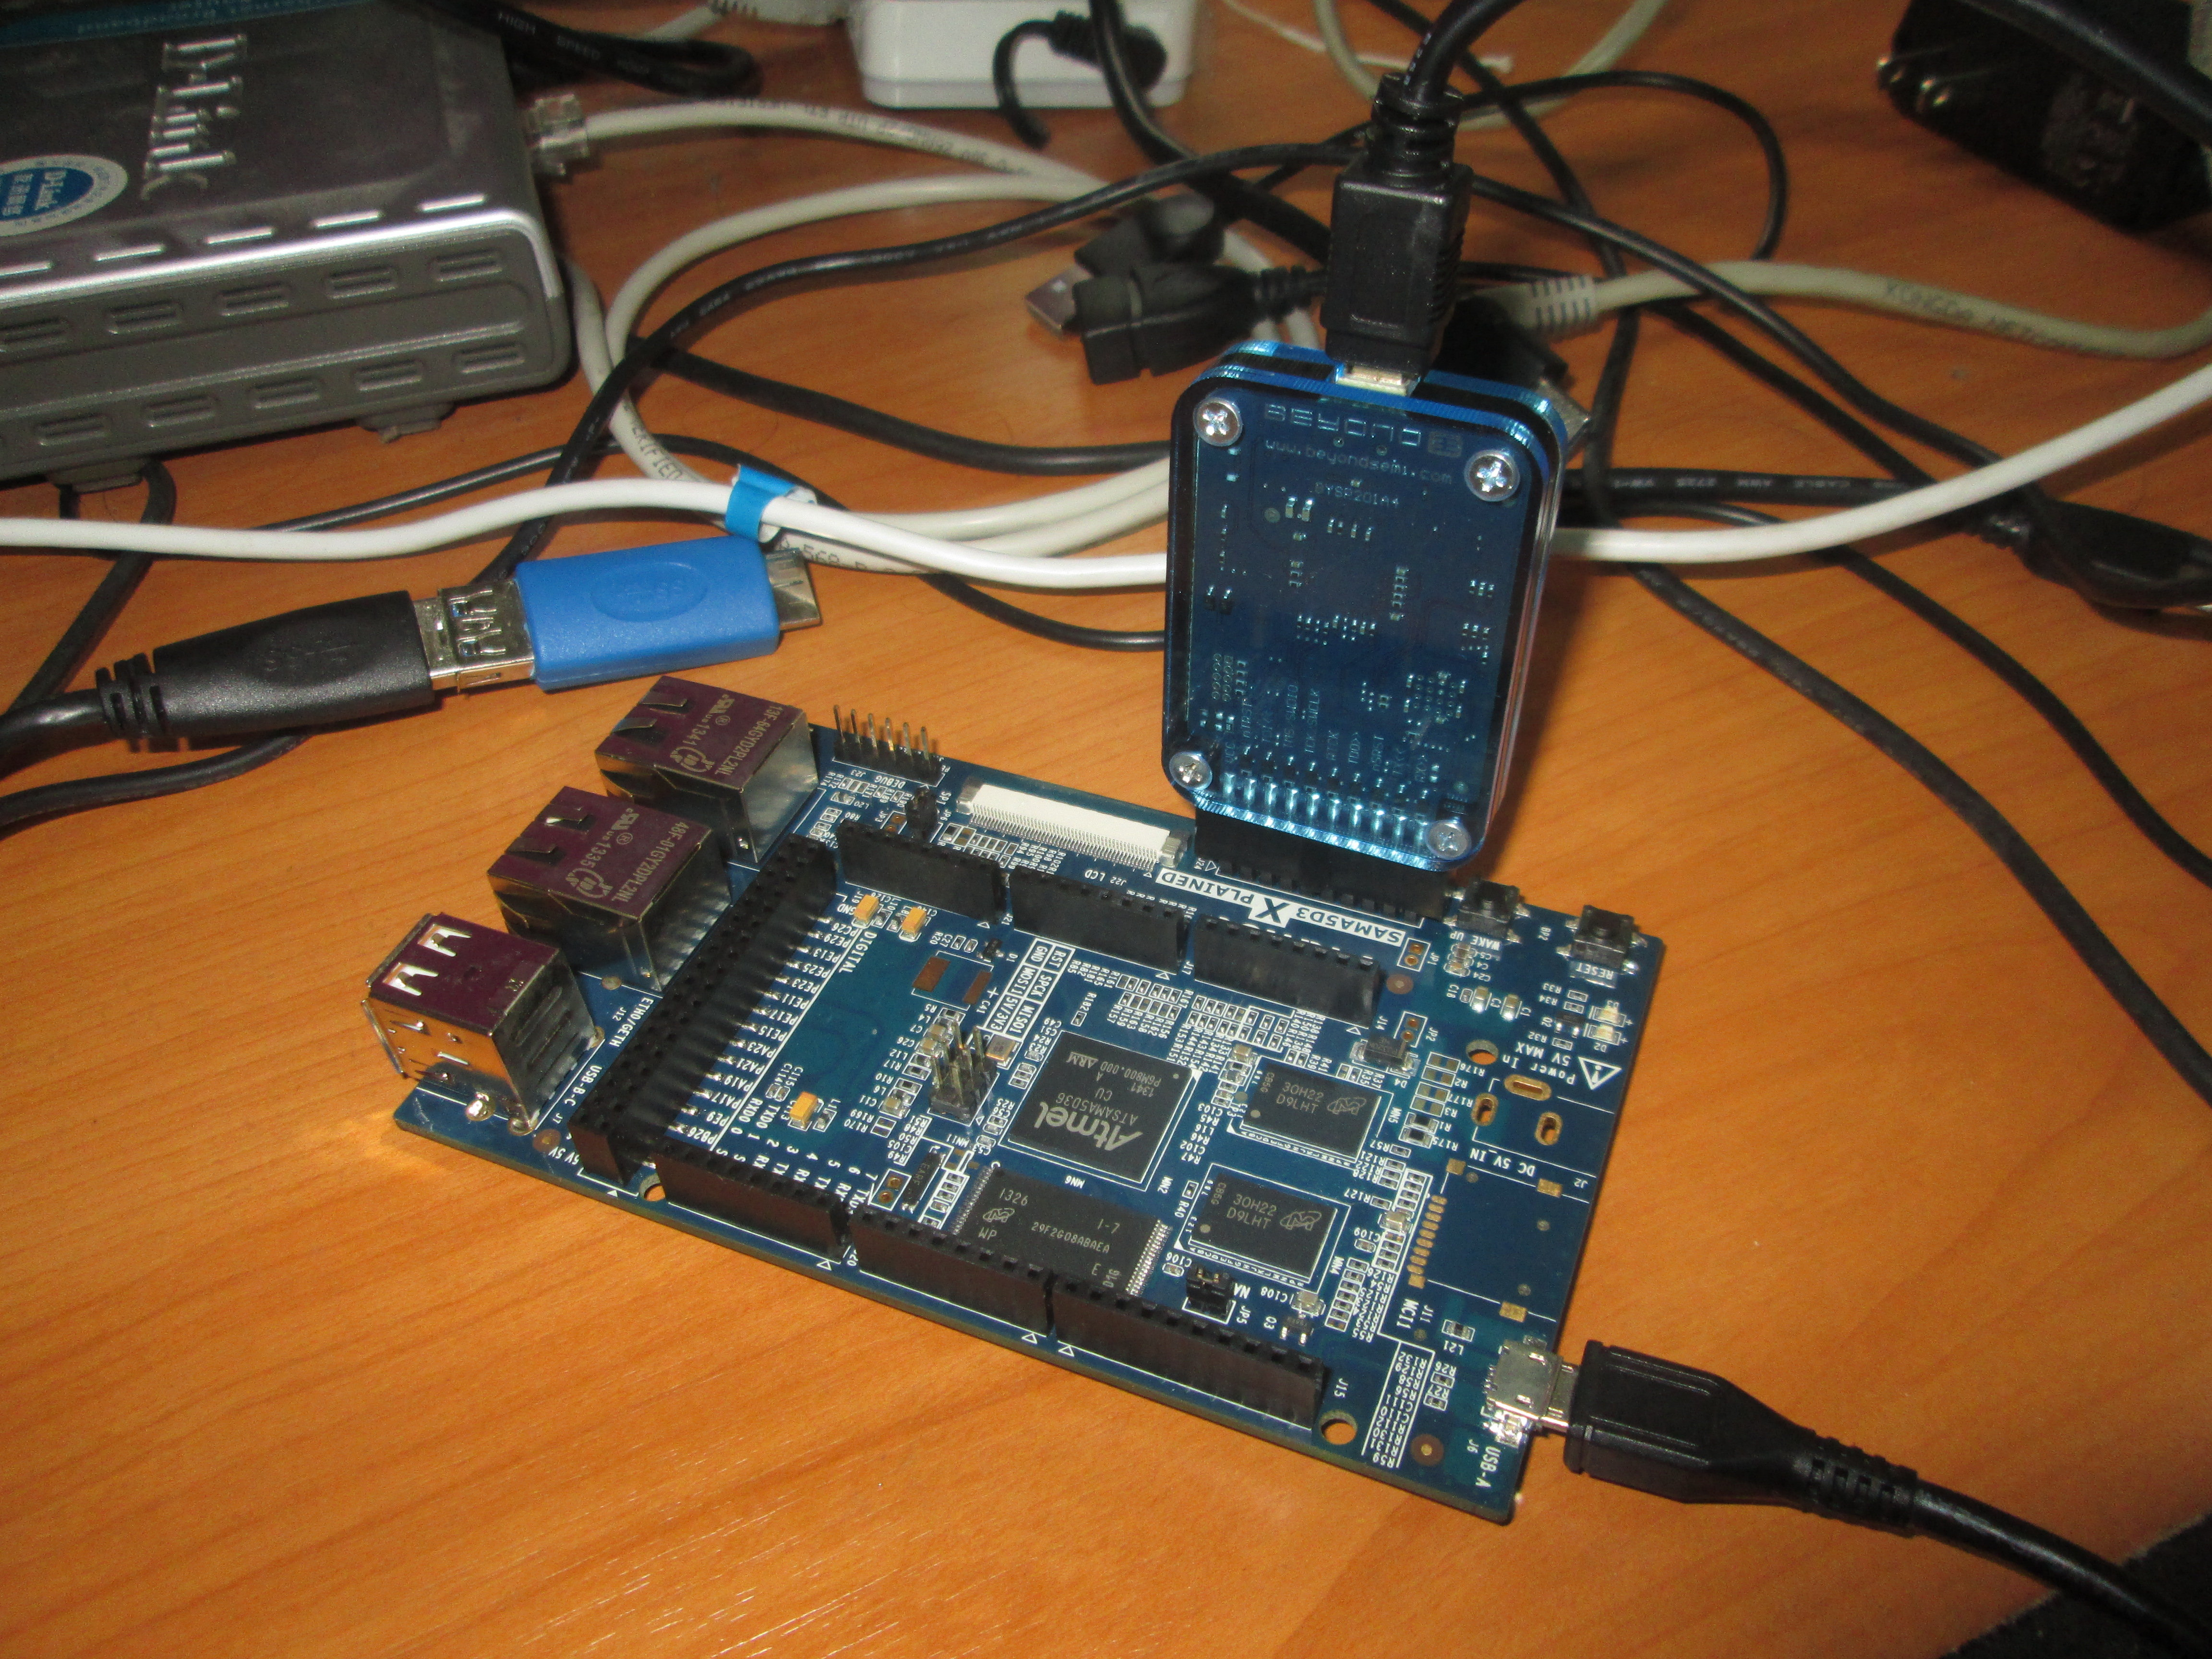 Beyond Debug Key Enables JTAG & UART Debugging, Supports OpenOCD